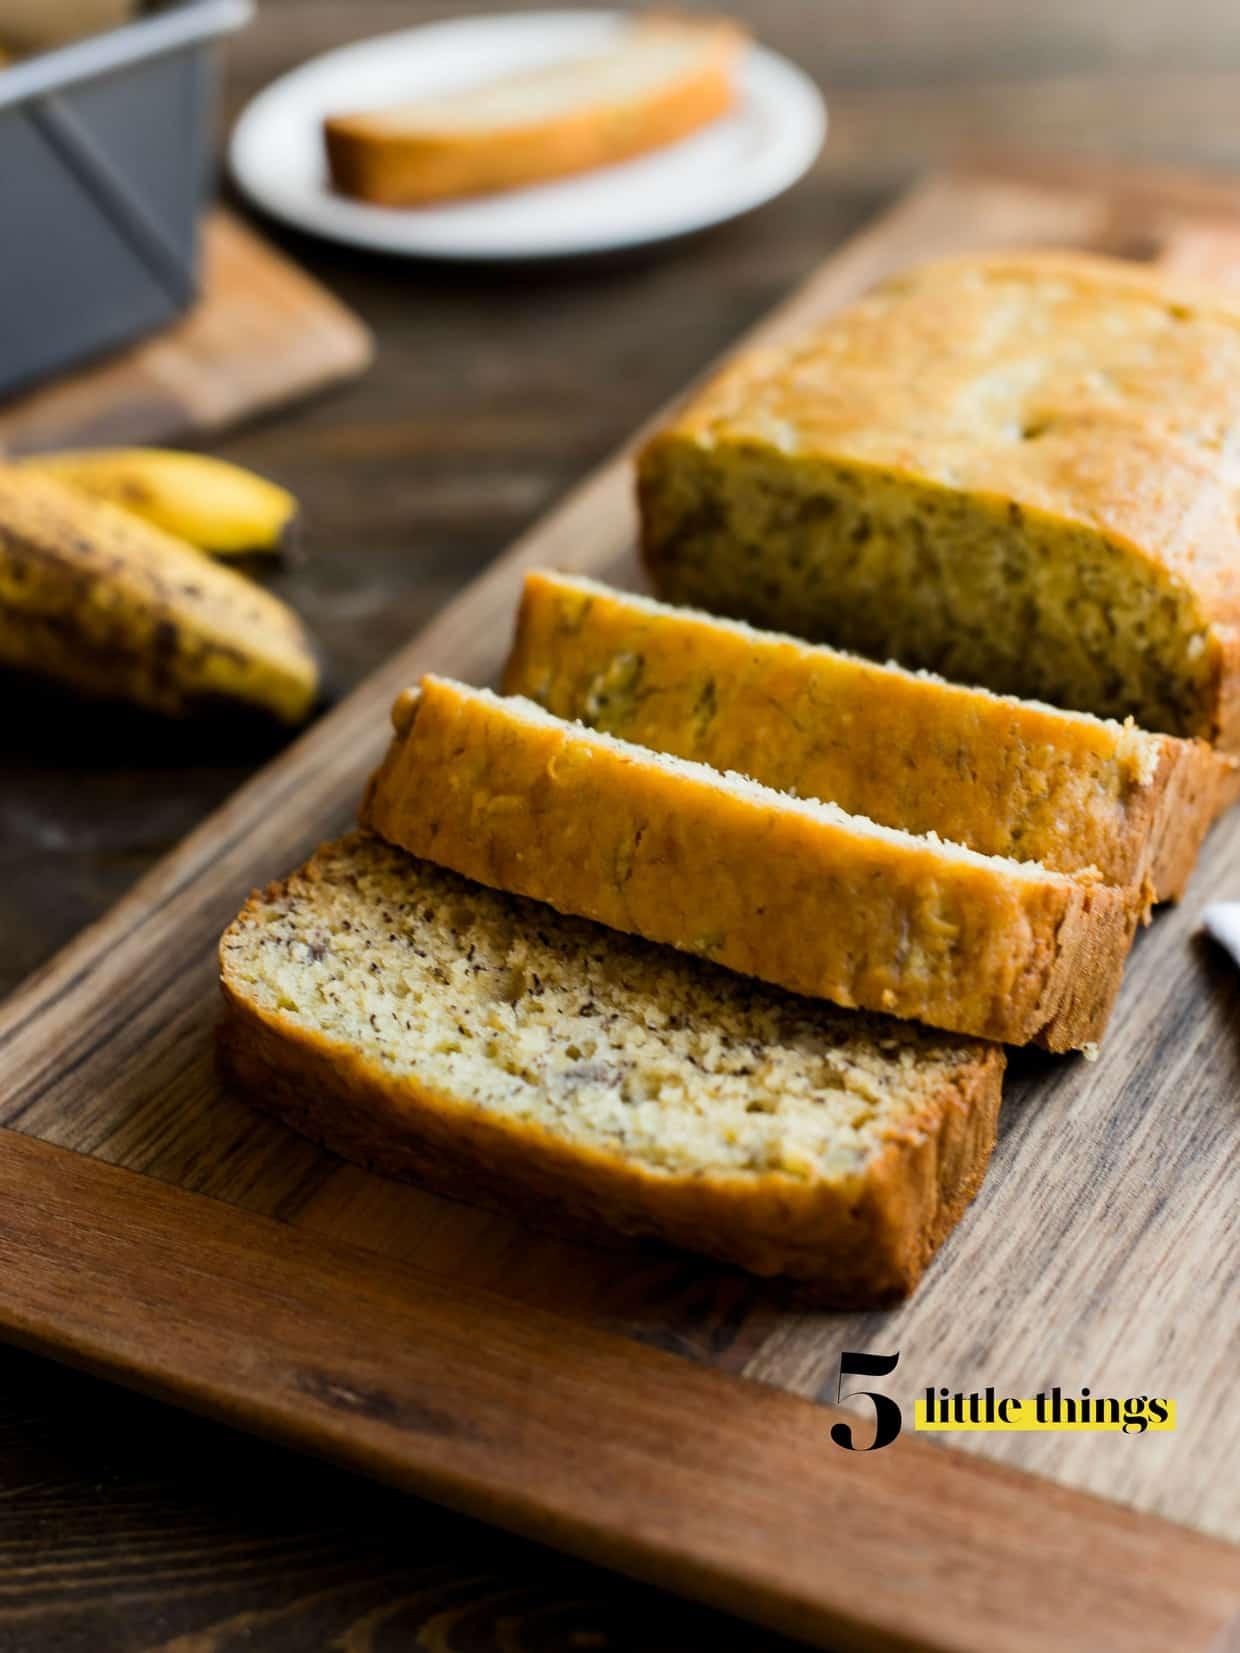 Banana bread sliced on a cutting board.